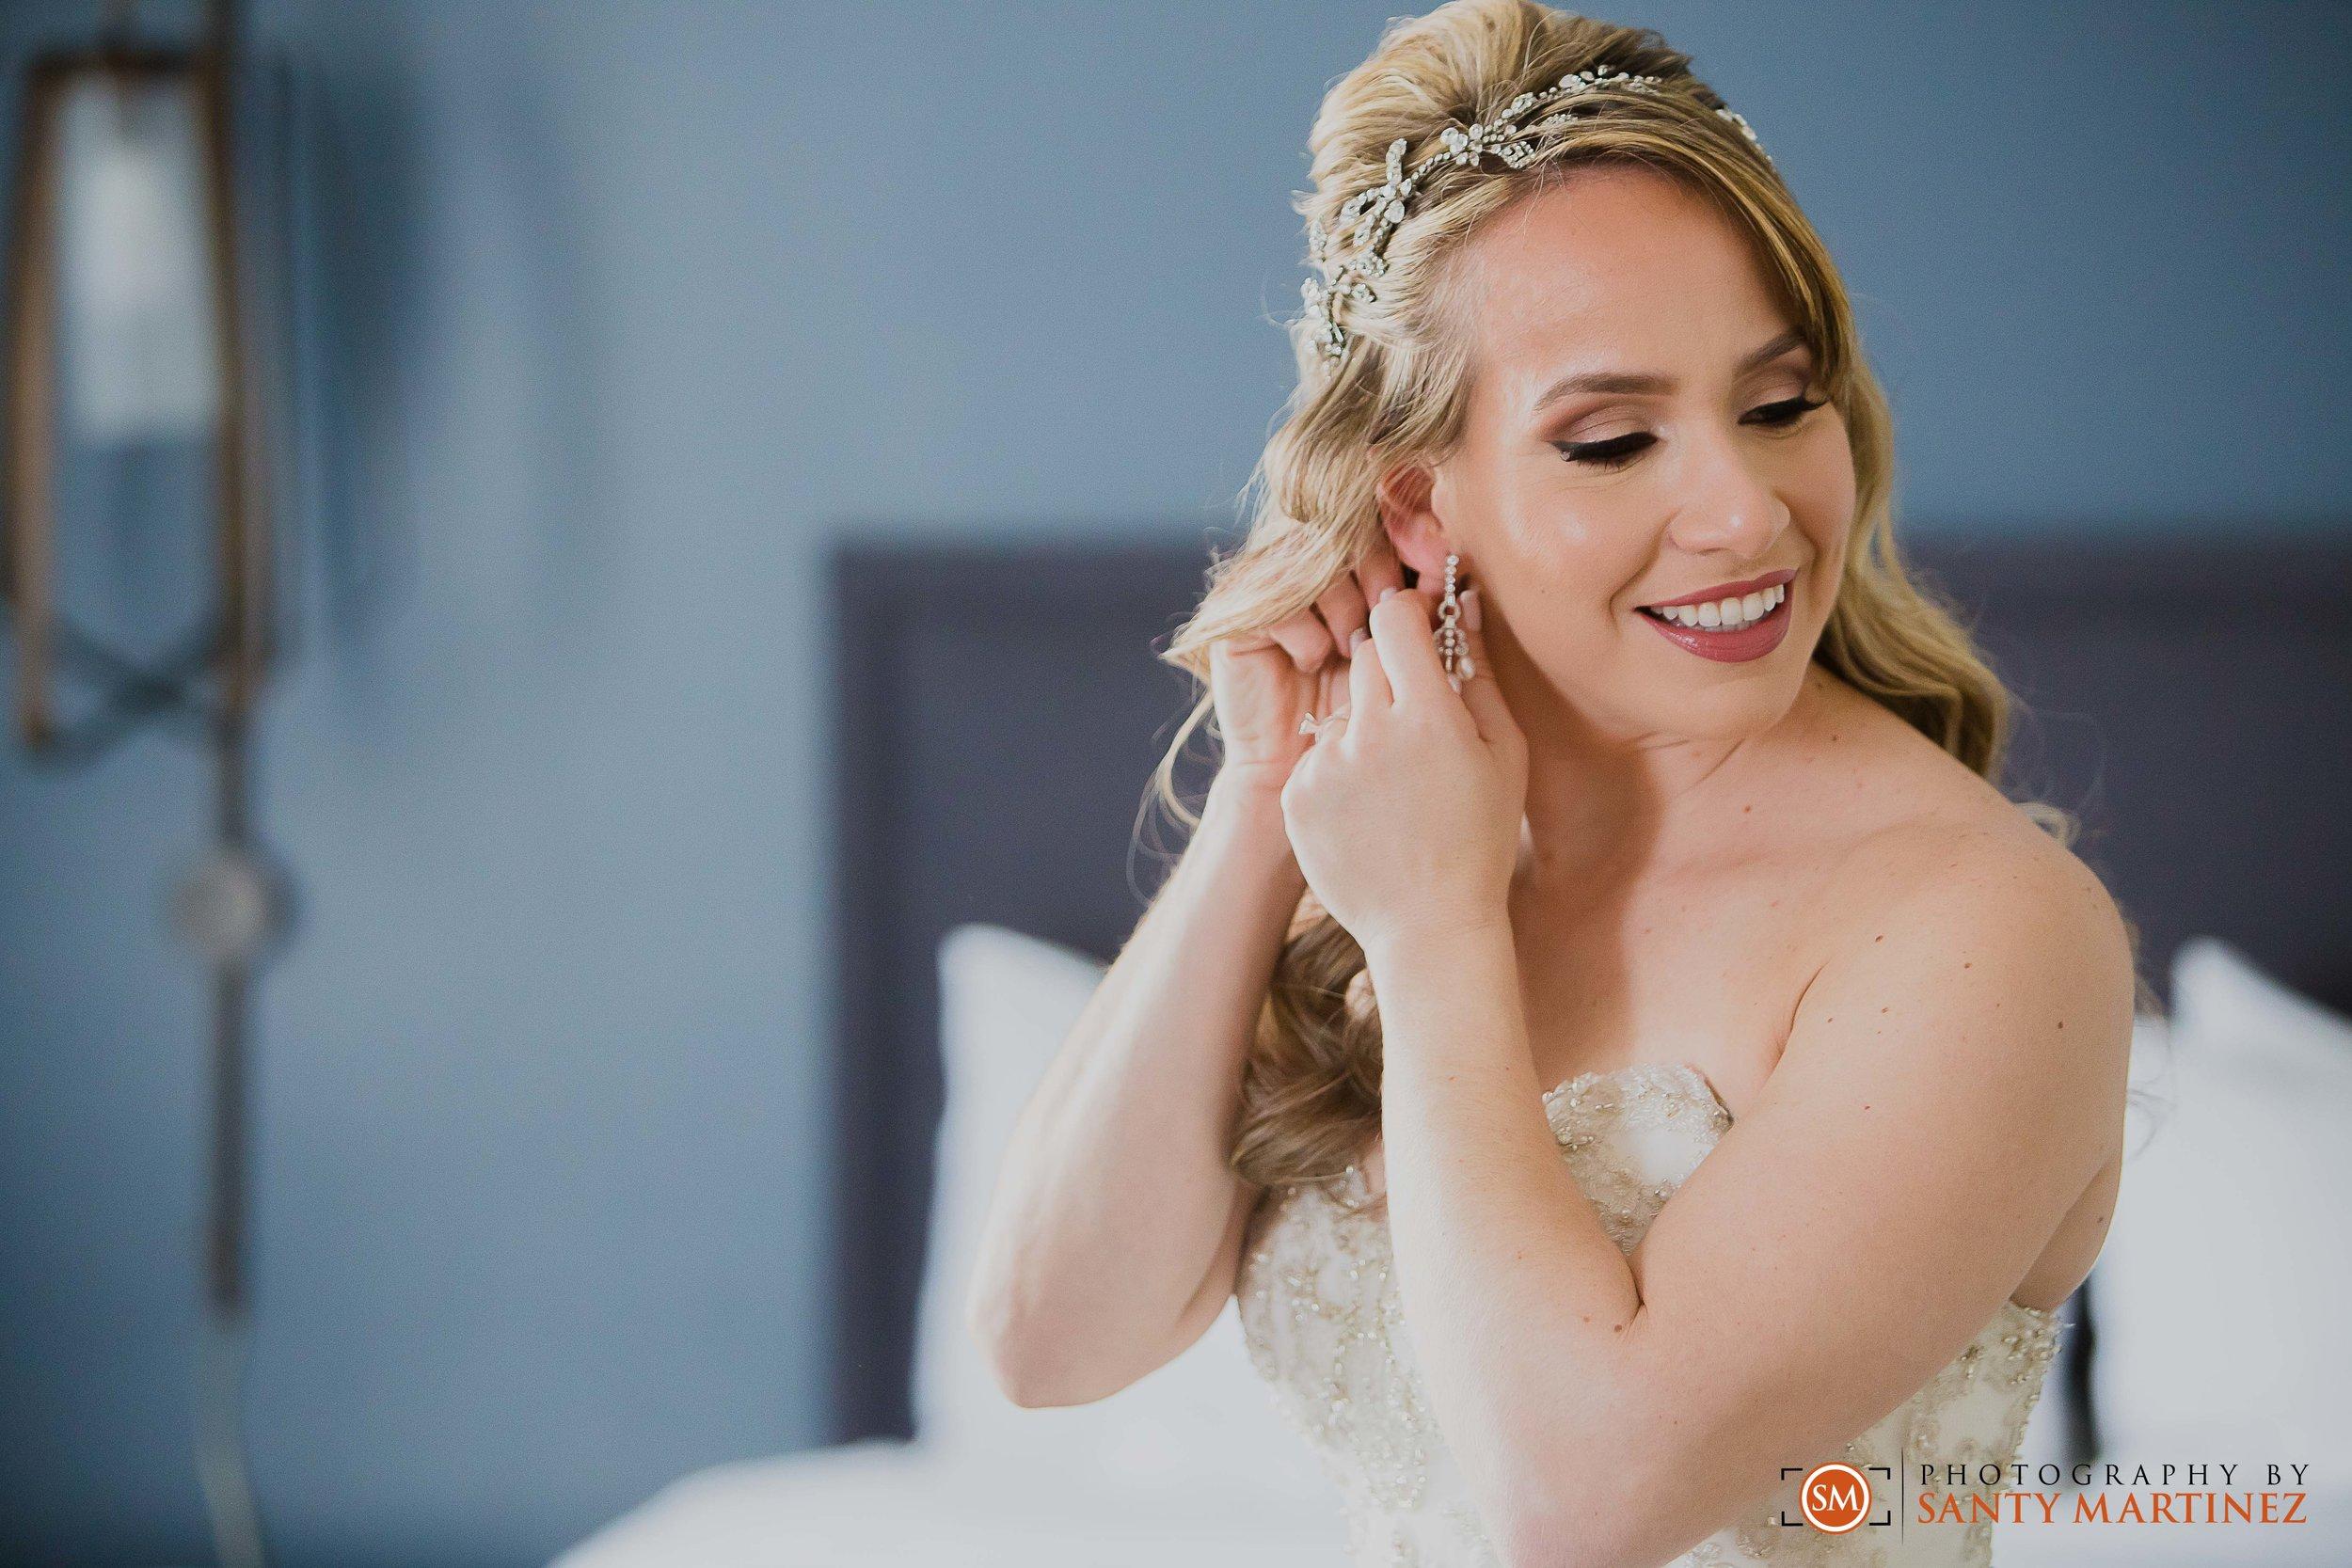 Wedding La Jolla Ballroom - Photography by Santy Martinez-9.jpg